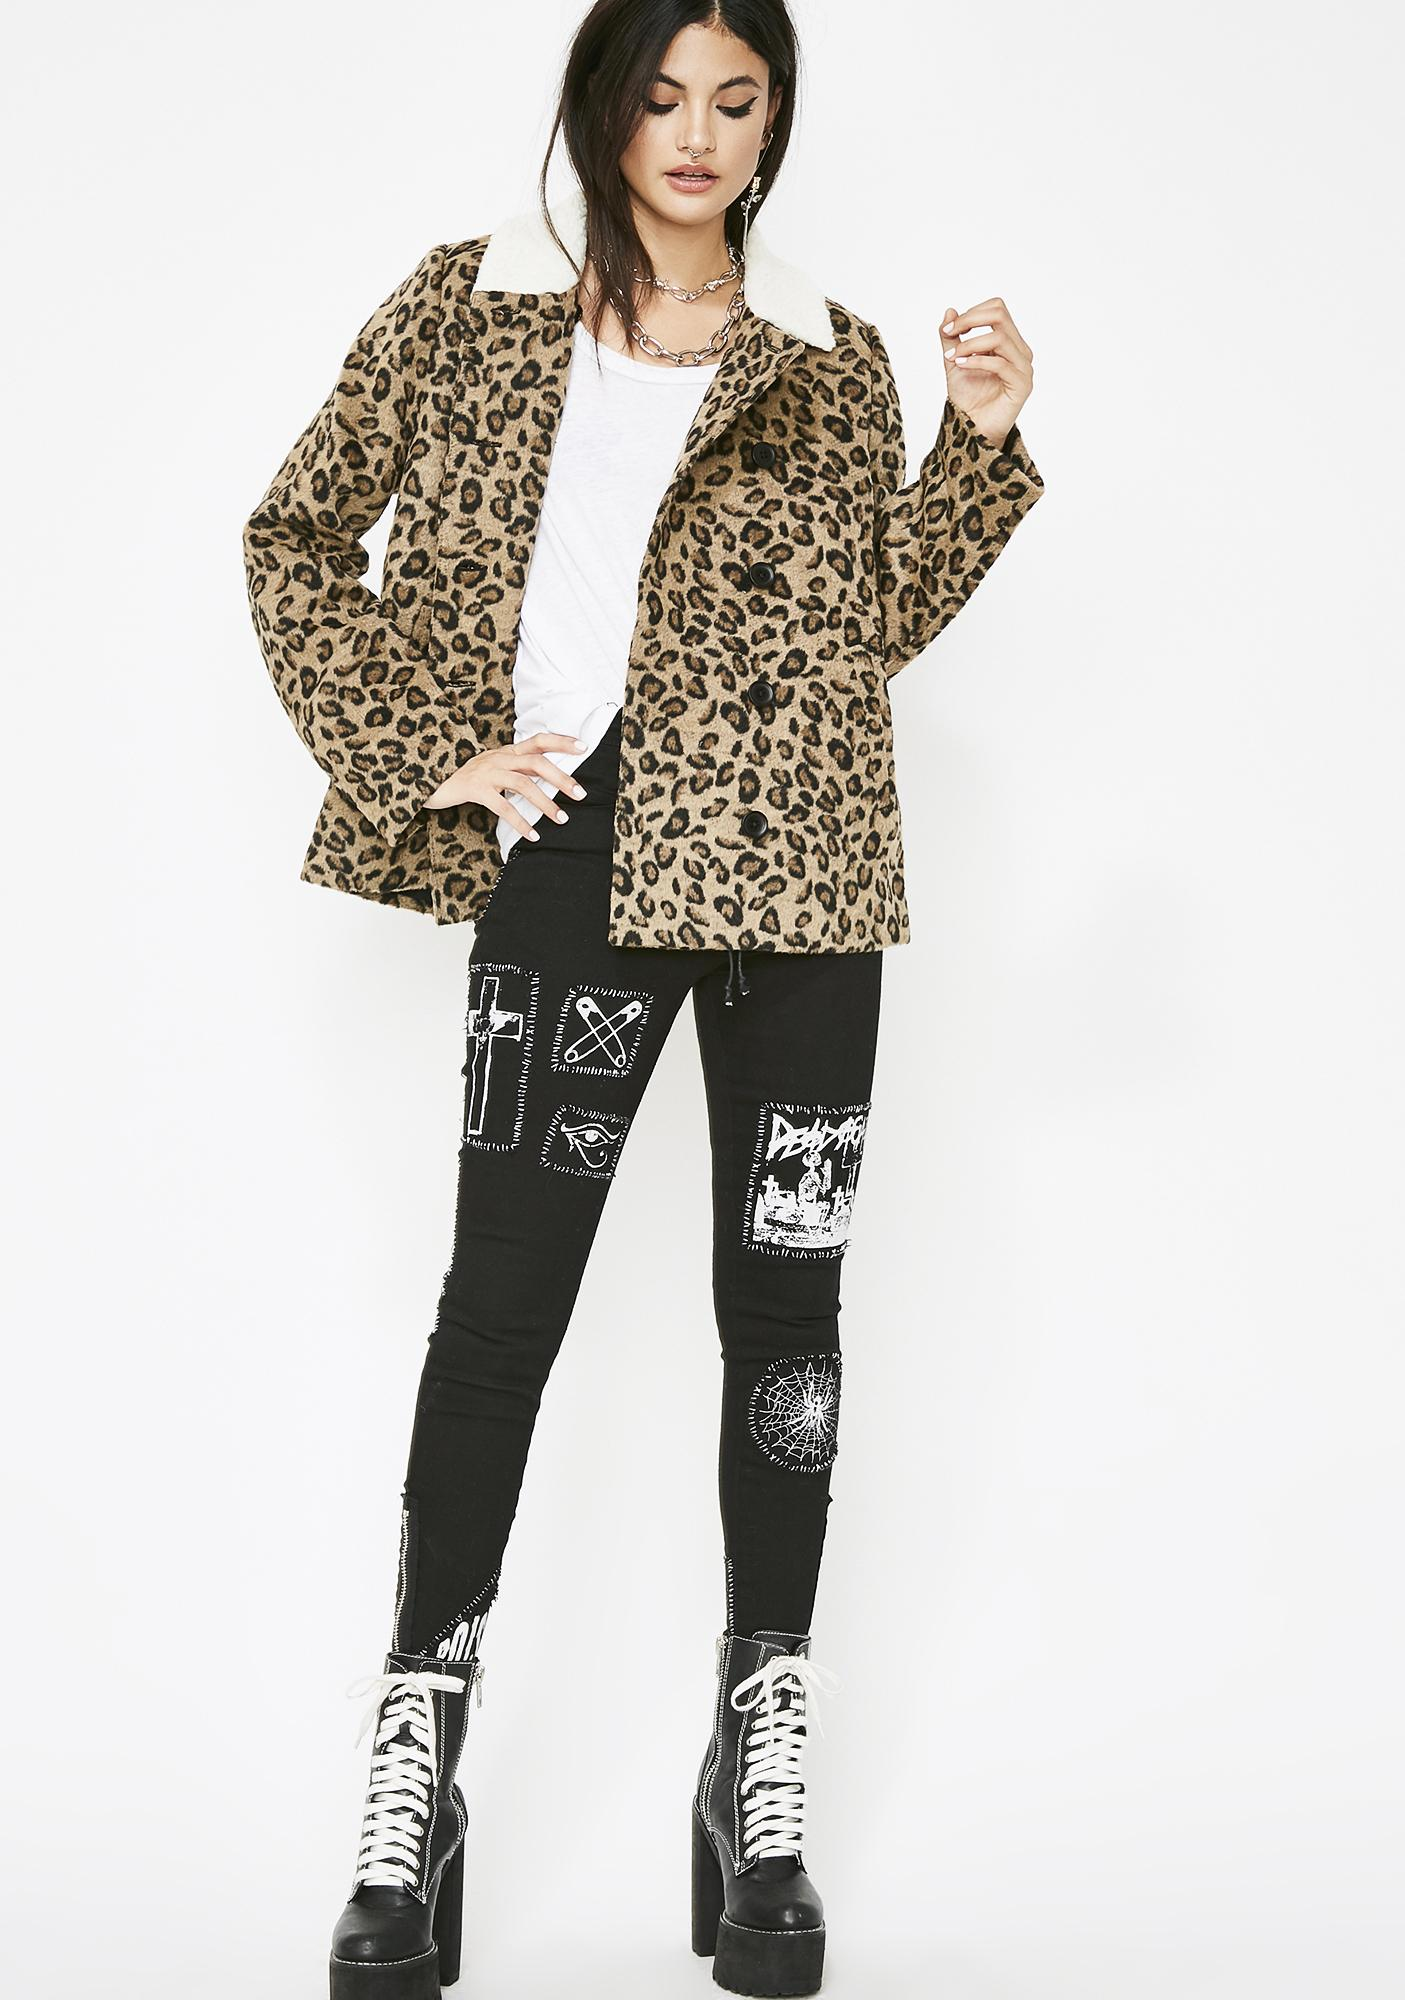 Sharp Claws Leopard Coat